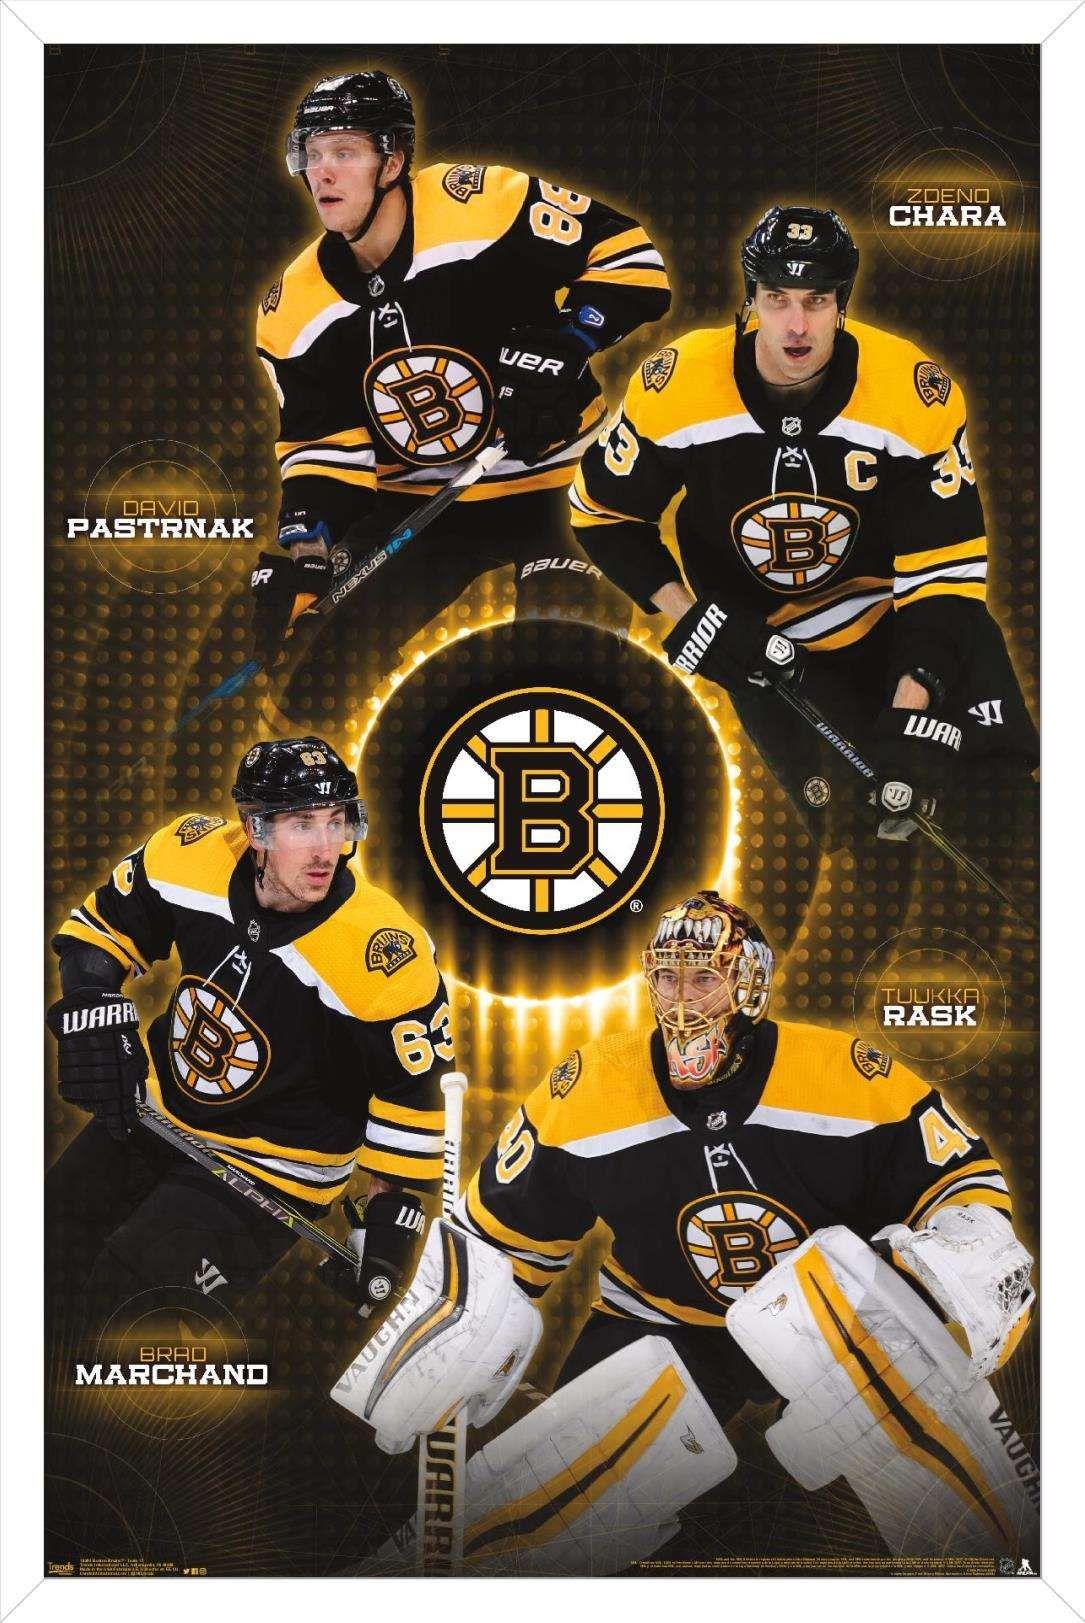 Nhl Boston Bruins Team 17 Poster In 2021 Nhl Boston Bruins Boston Bruins Boston Bruins Hockey